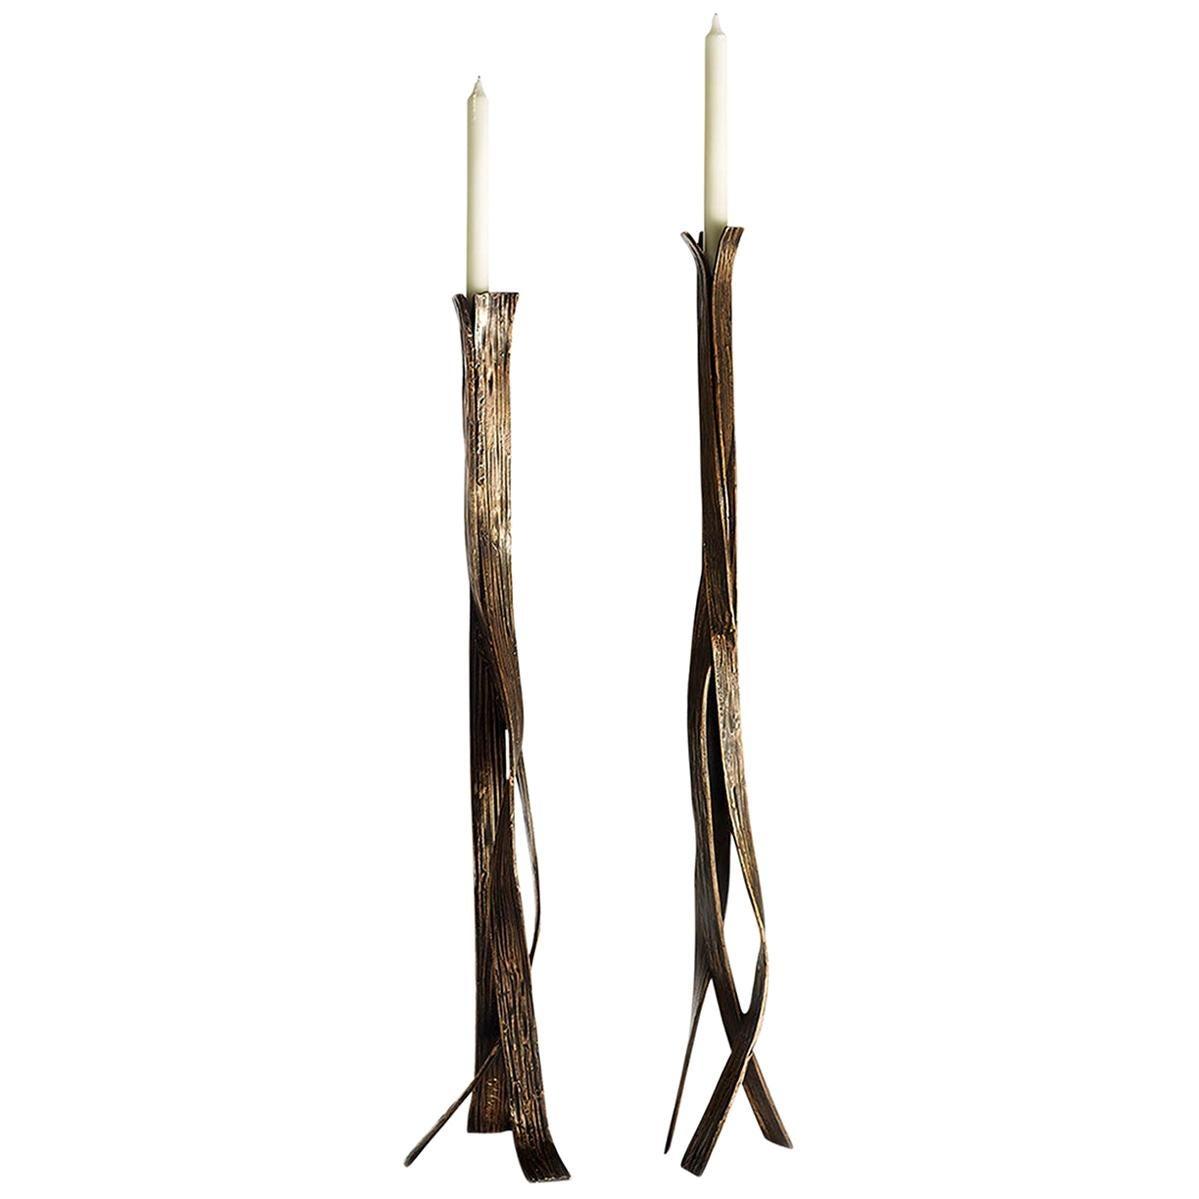 2-Ribbon Sculptural Candleholders